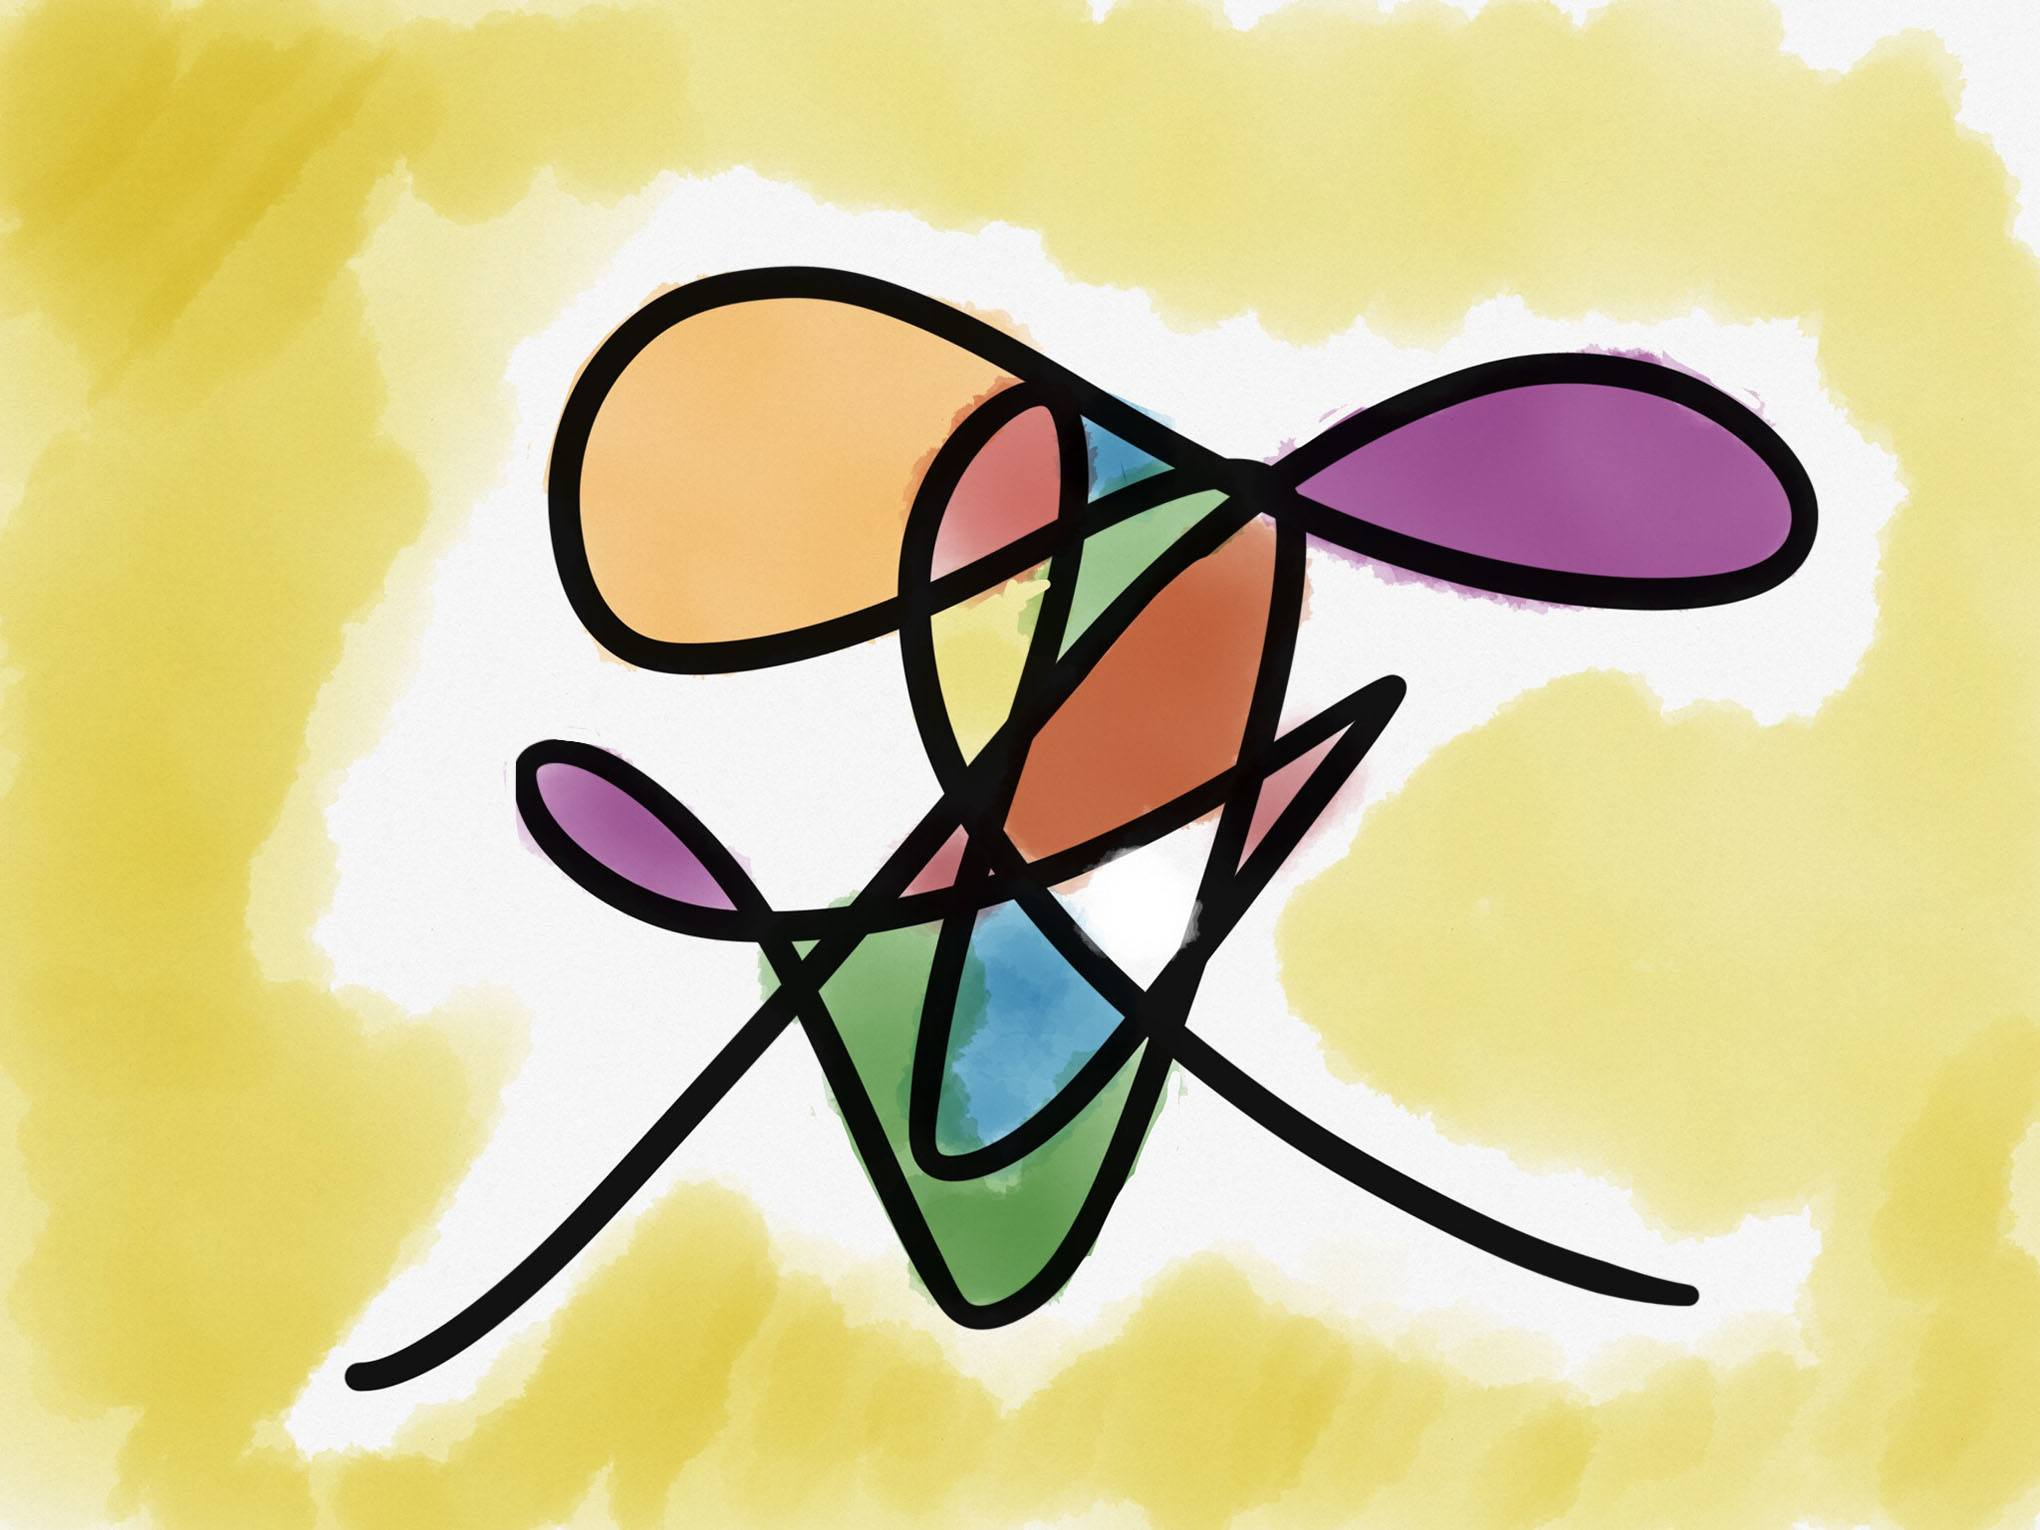 design av logga - logotyp